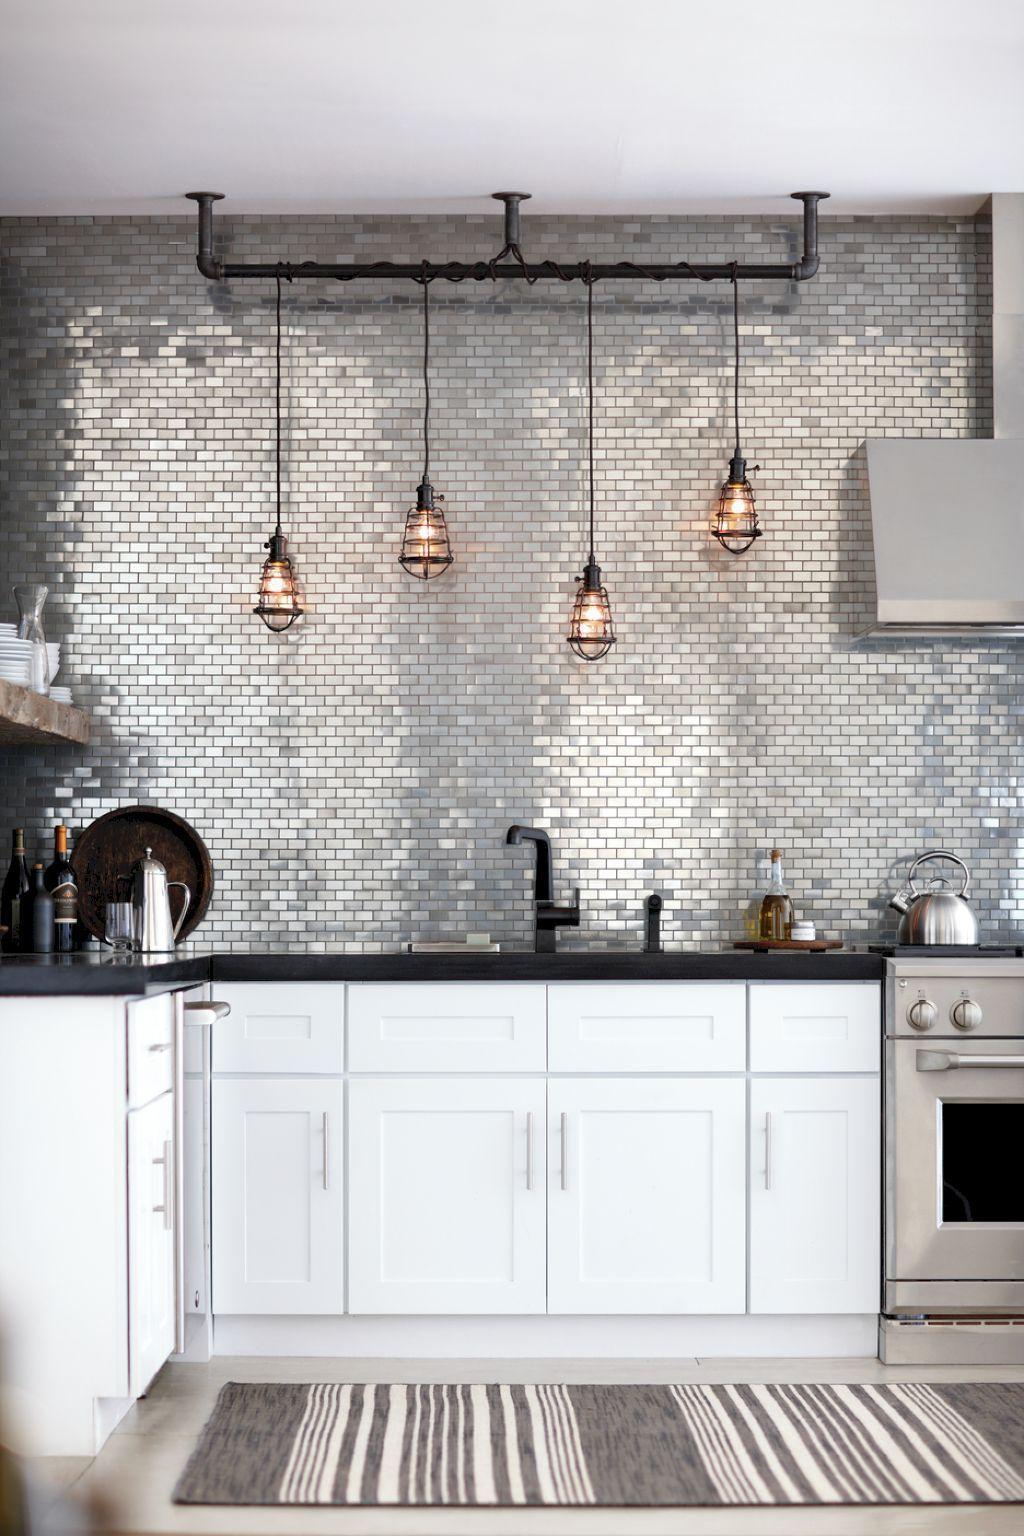 Beauty kitchen backsplash design ideas love this backsplash